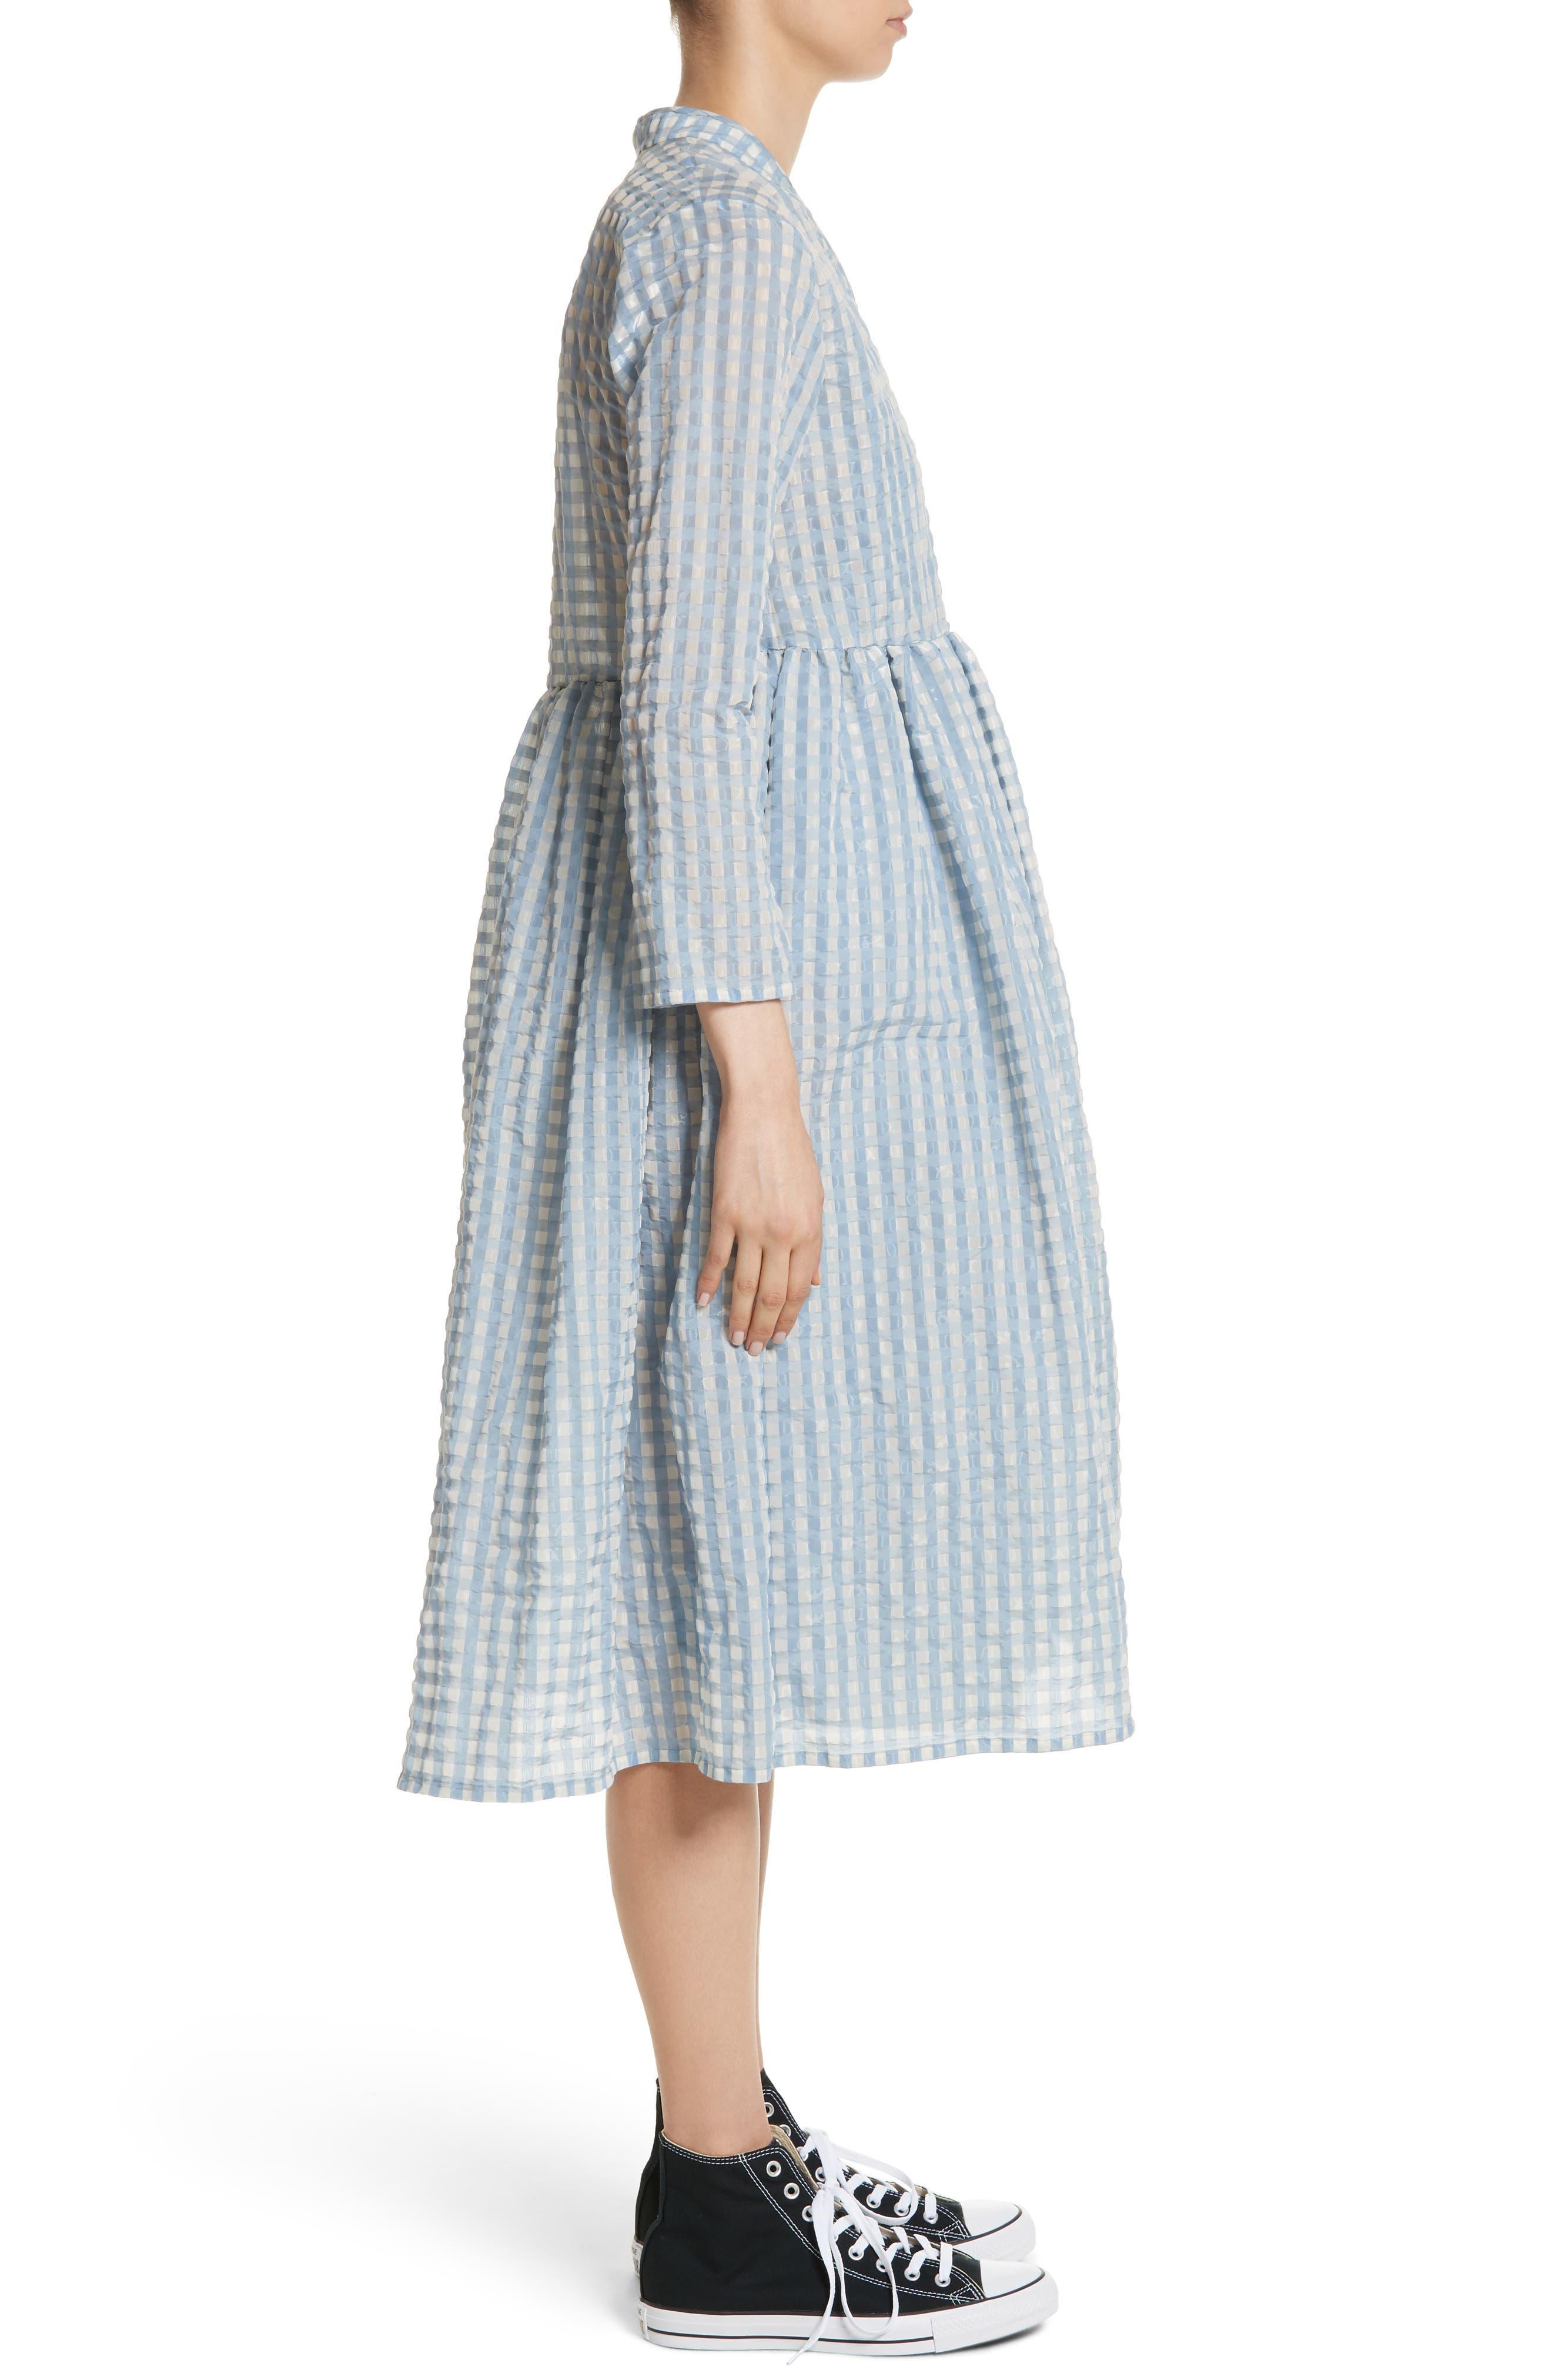 Hermione Gingham Seersucker Dress,                             Alternate thumbnail 3, color,                             Blue